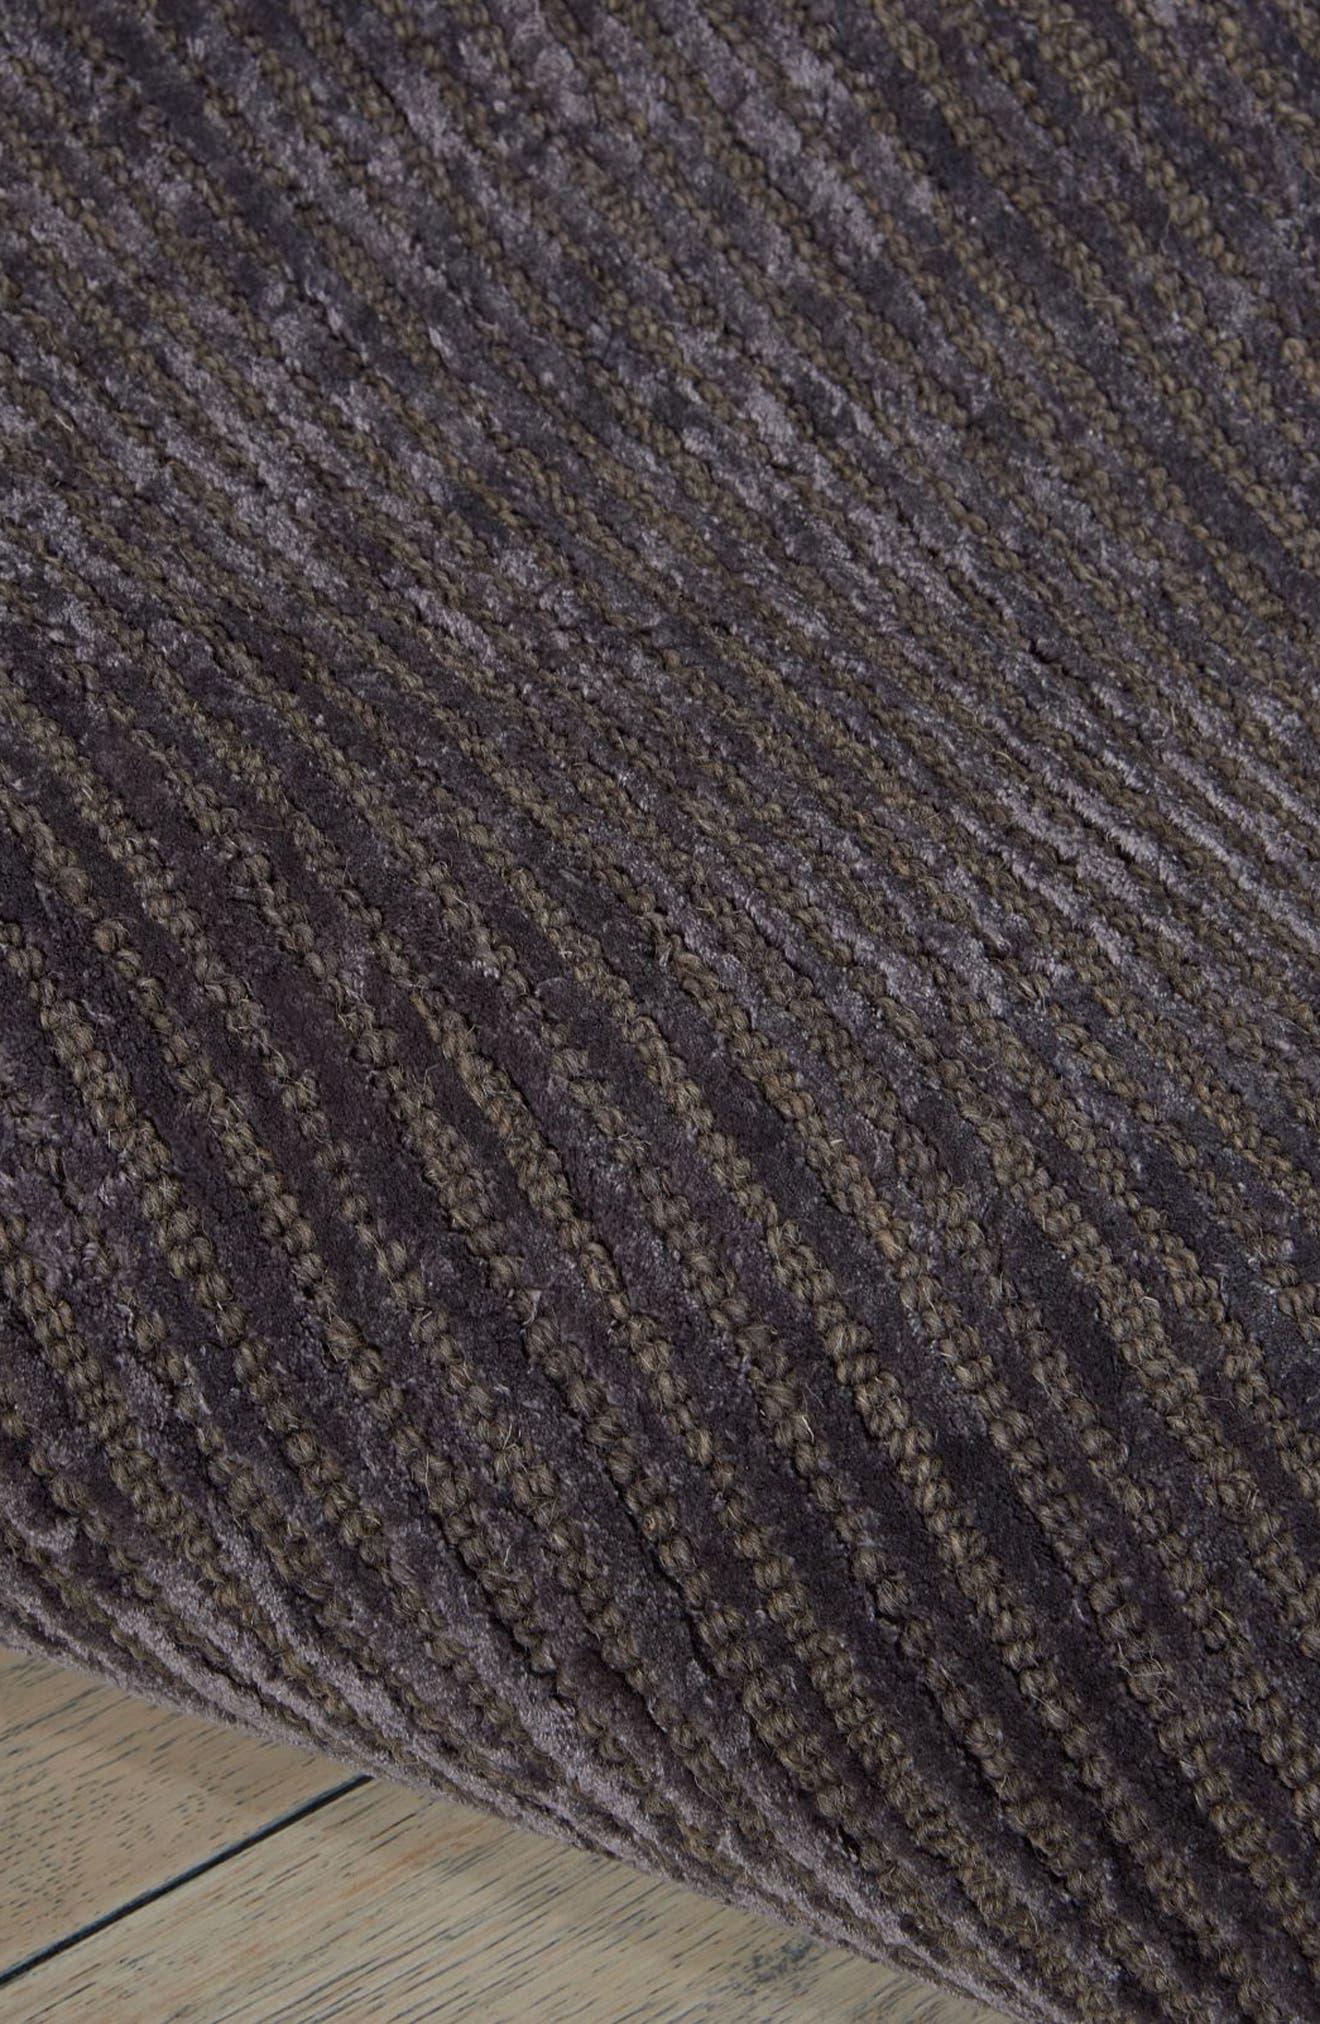 Ravine Furrow Handwoven Area Rug,                             Alternate thumbnail 5, color,                             001